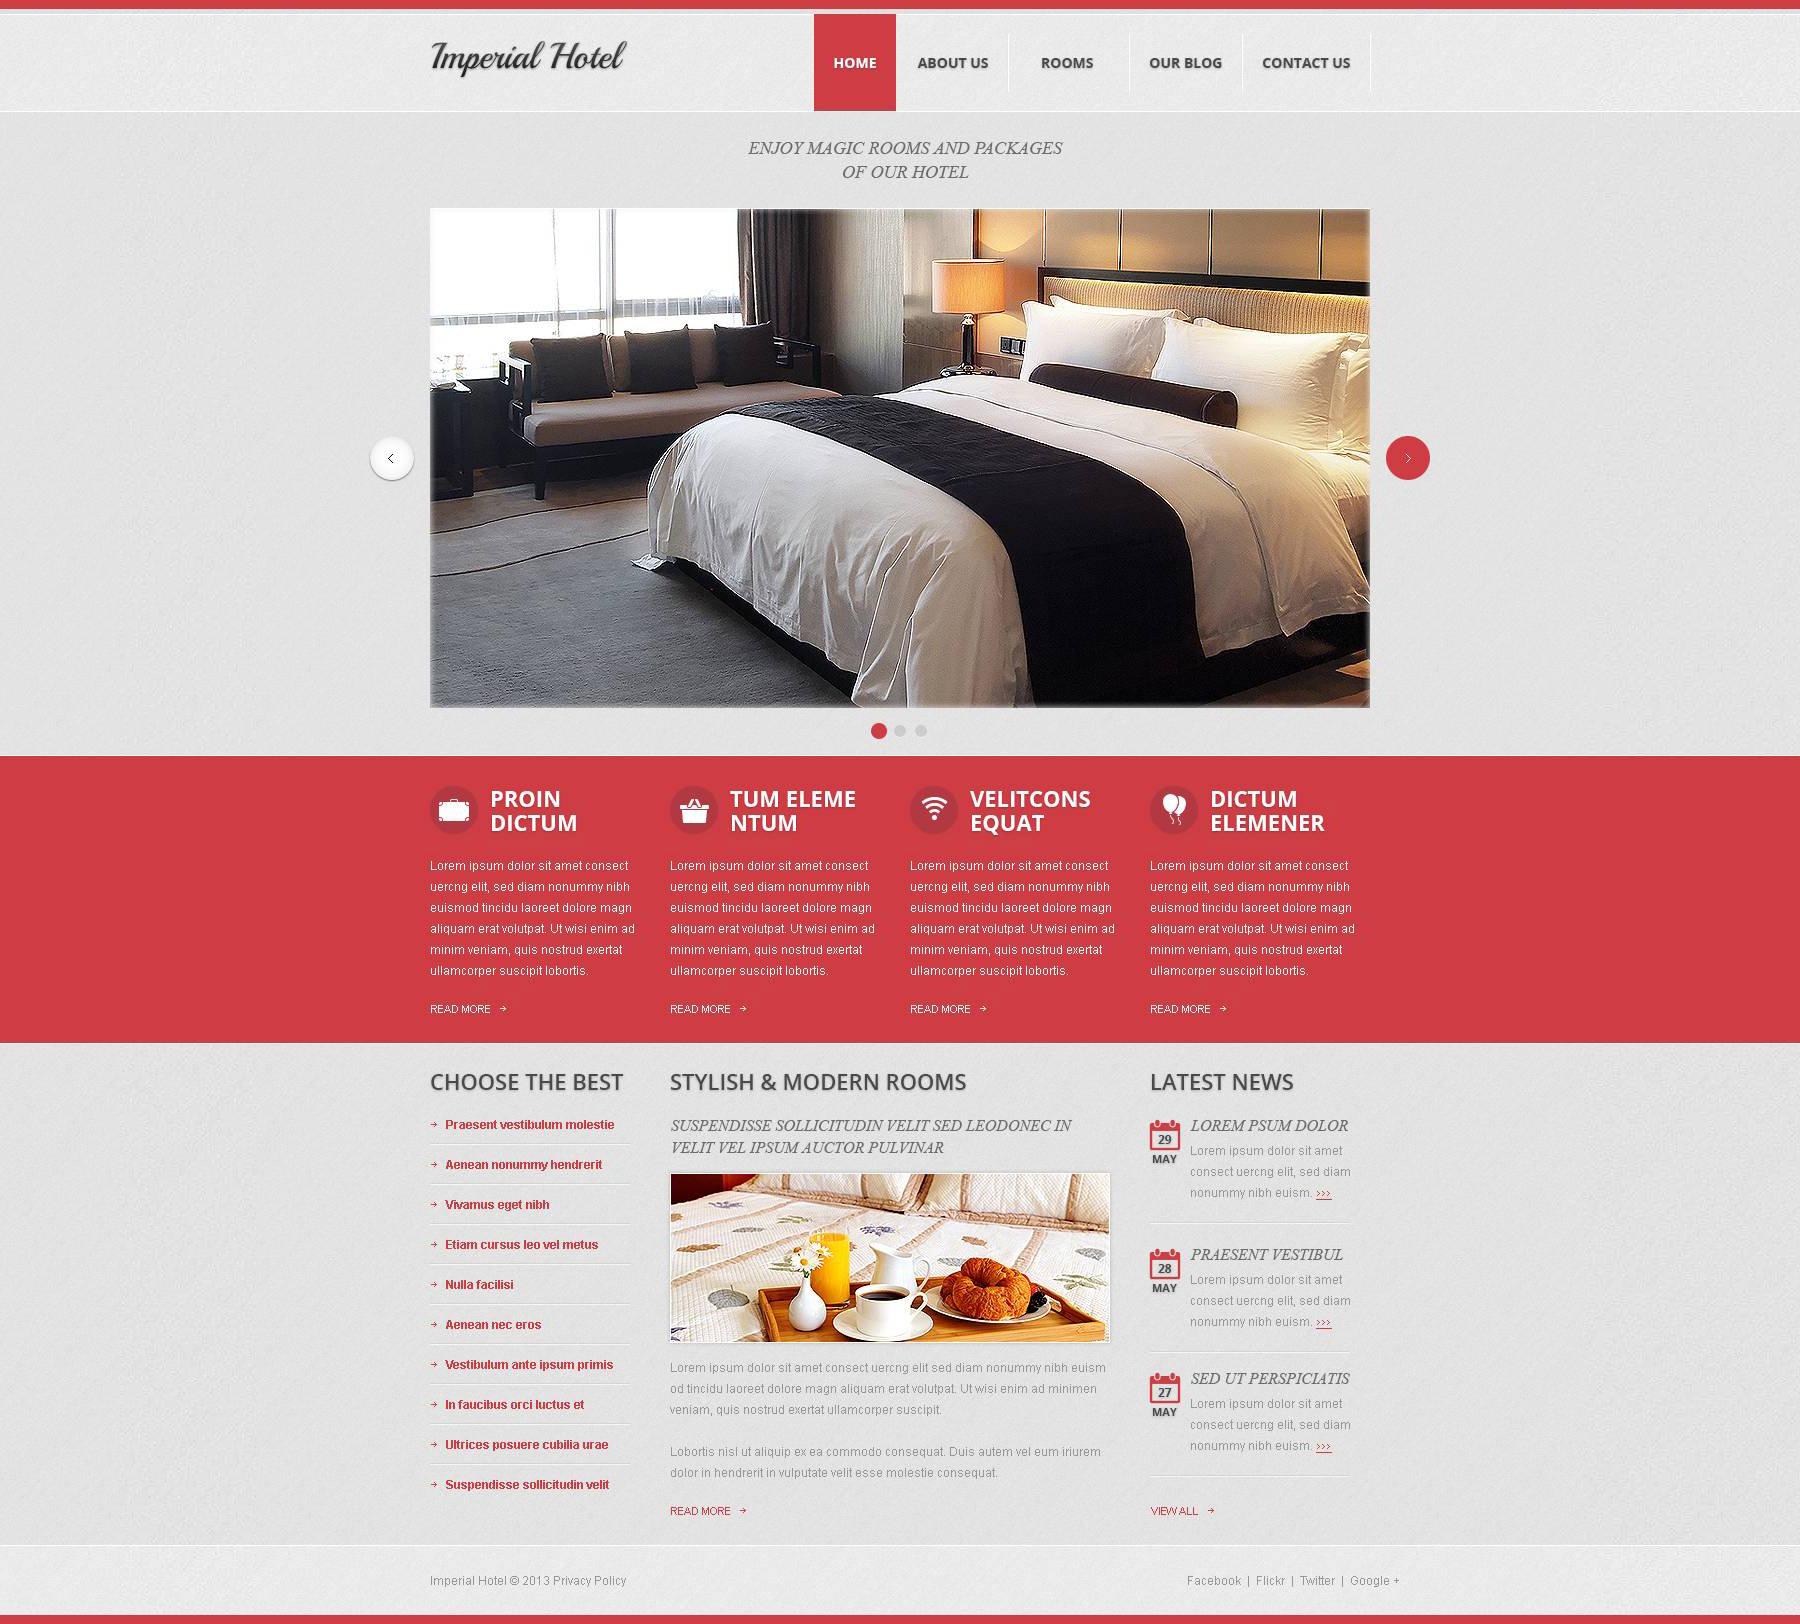 Imperial Hotel Drupal Template - screenshot